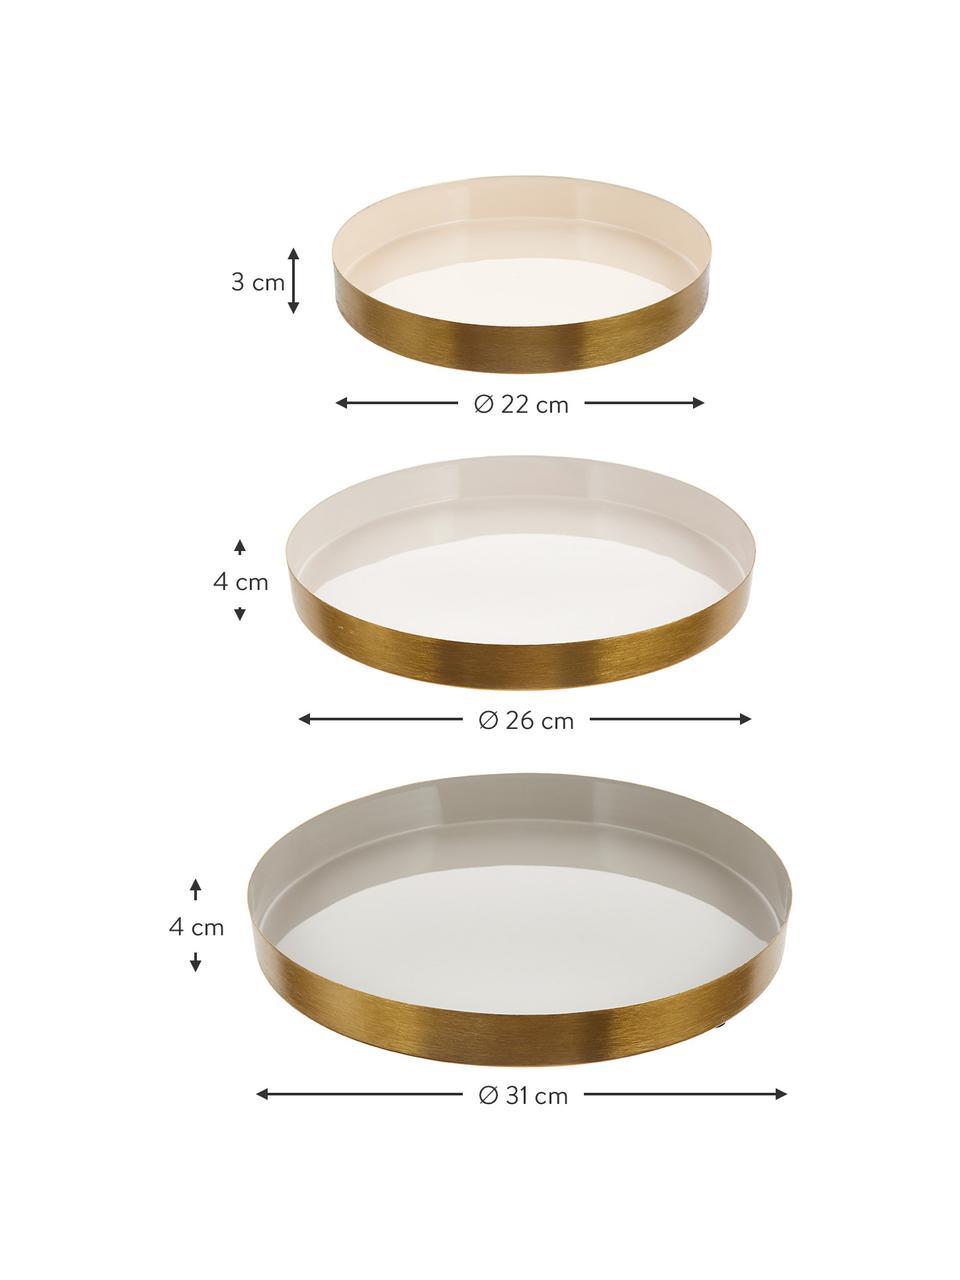 Set 3 vassoi decorativi Ayra, Metallo verniciato, Grigio, beige, bianco Bordo esterno: dorato, Set in varie misure